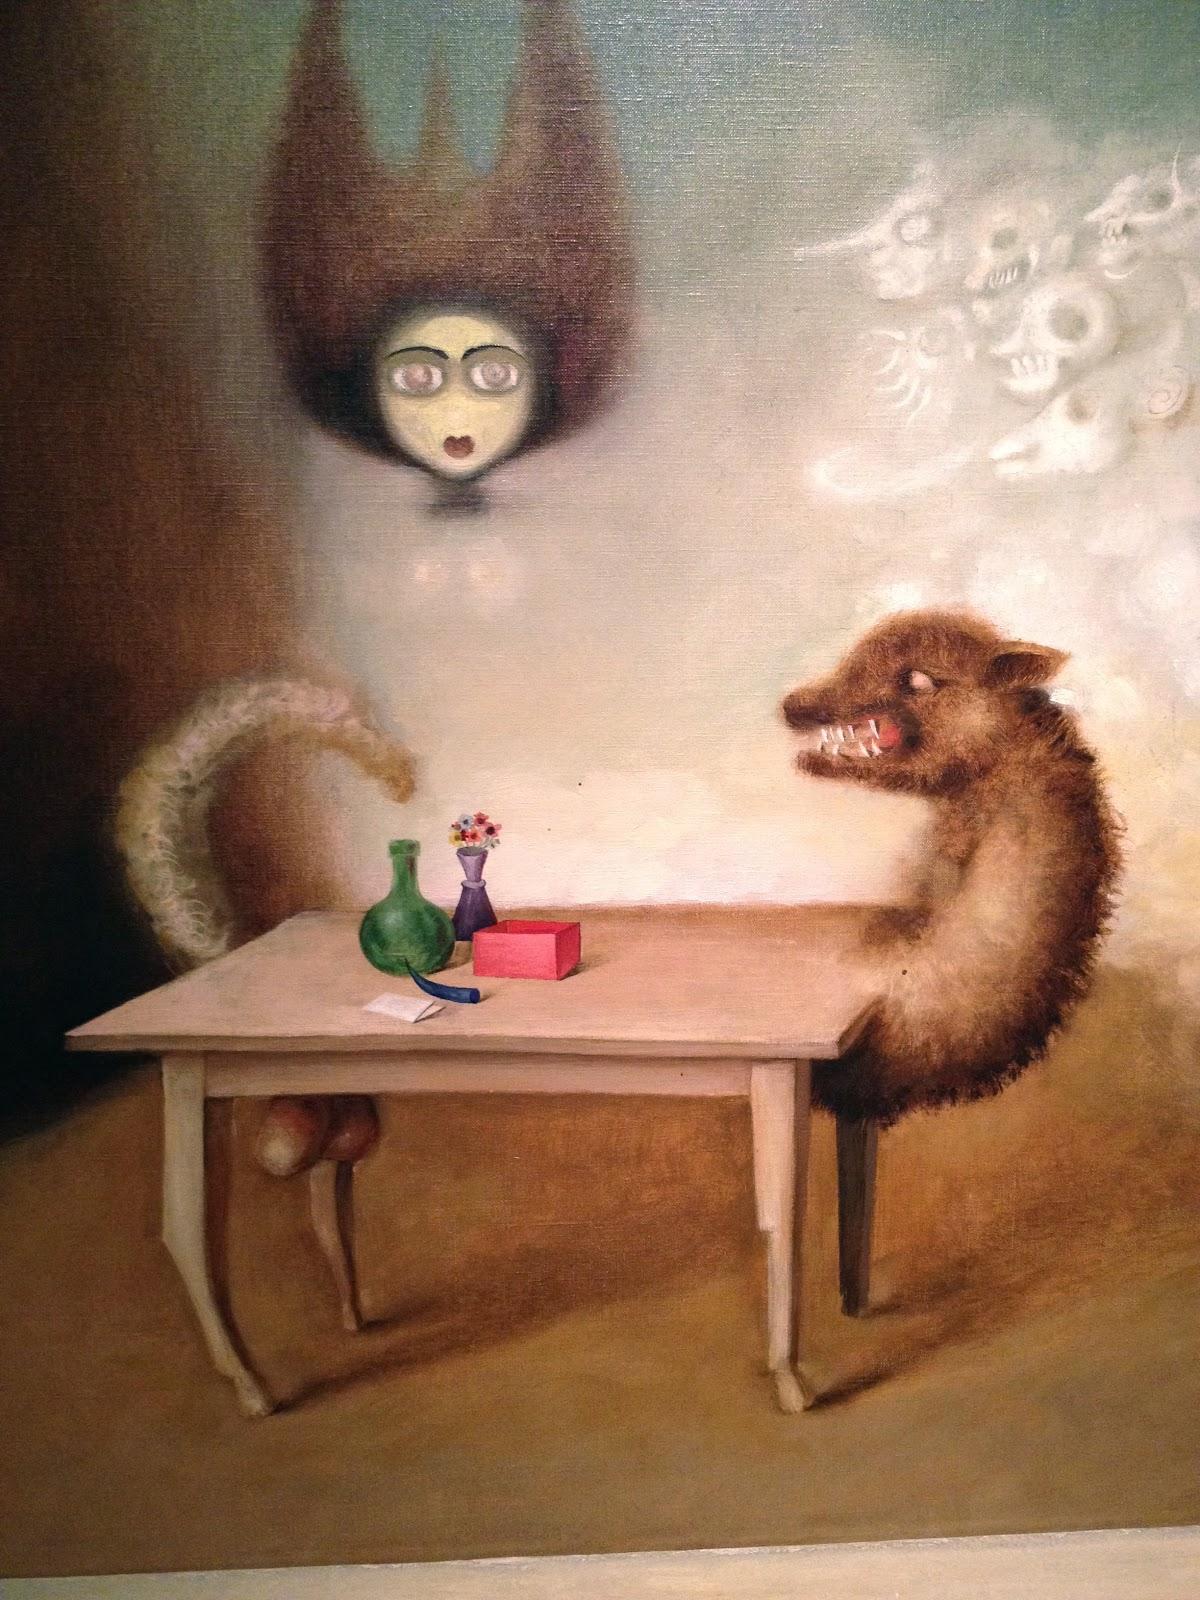 Wonderful victor brauner loup table 12 victor brauner surrealist painter tuttu0027art - Victor brauner loup table ...